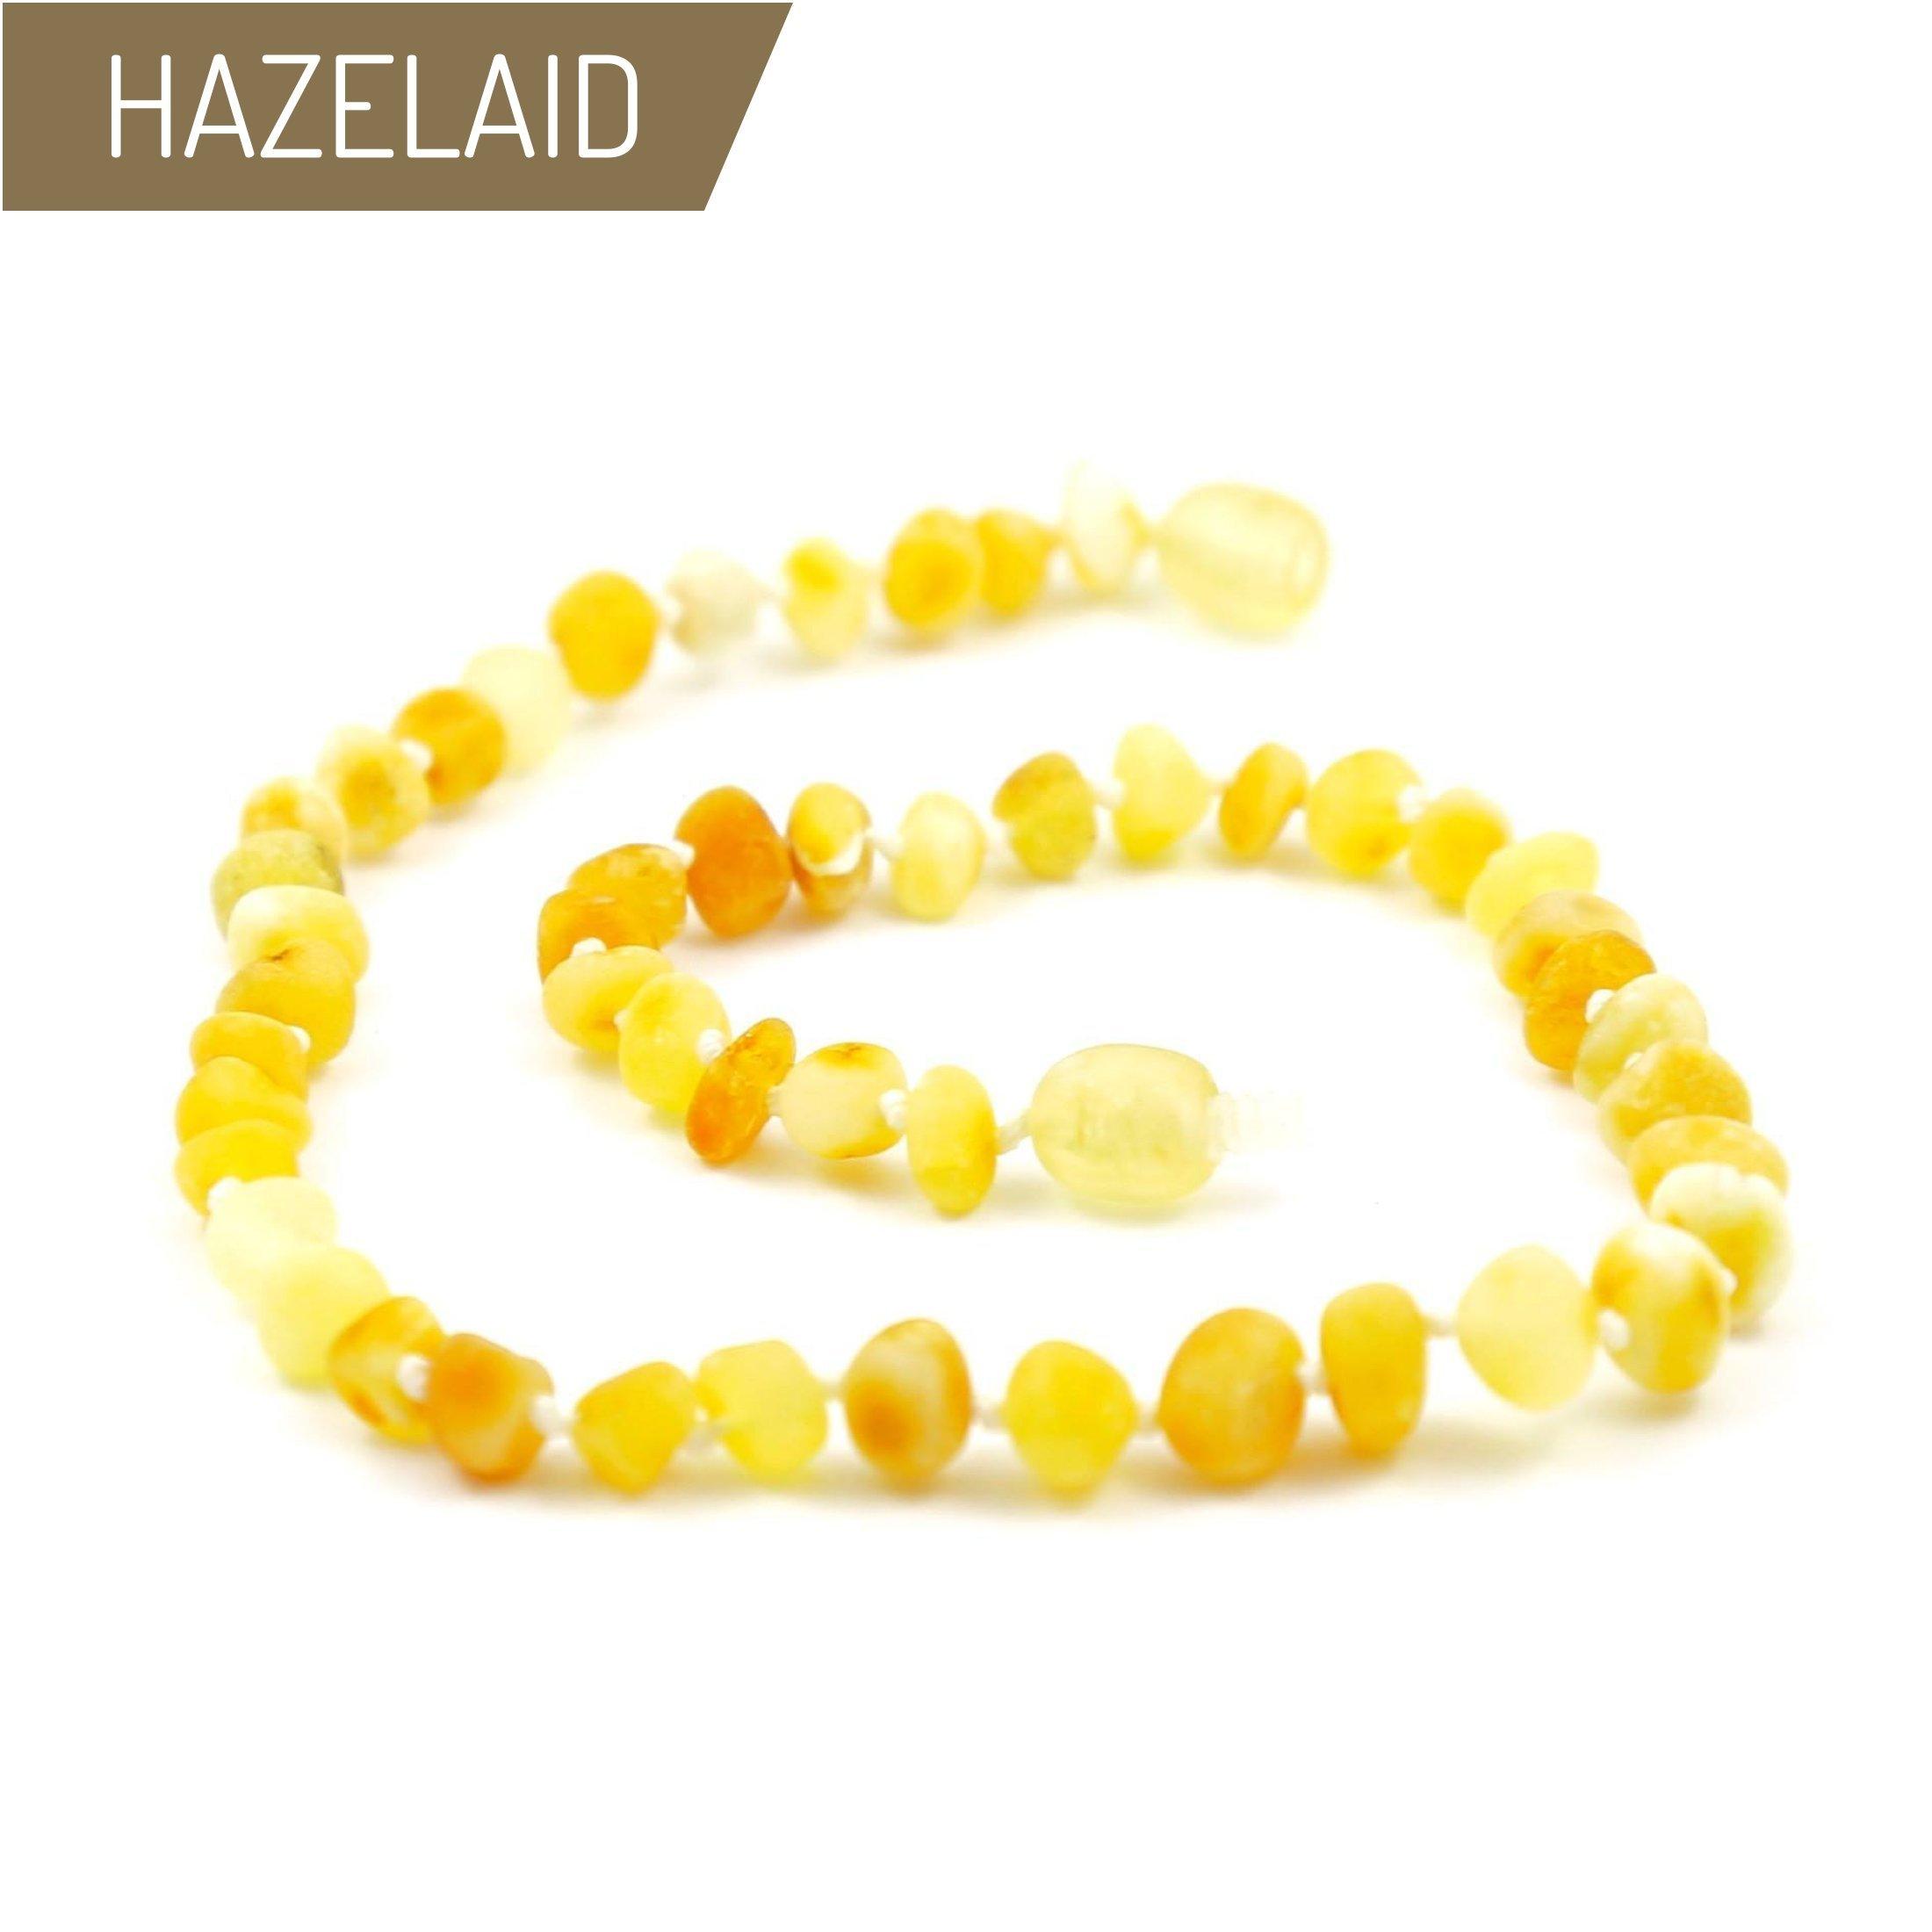 Hazelaid (TM) 11'' Twist-Clasp Baltic Amber Super Butter Necklace by HAZELAID